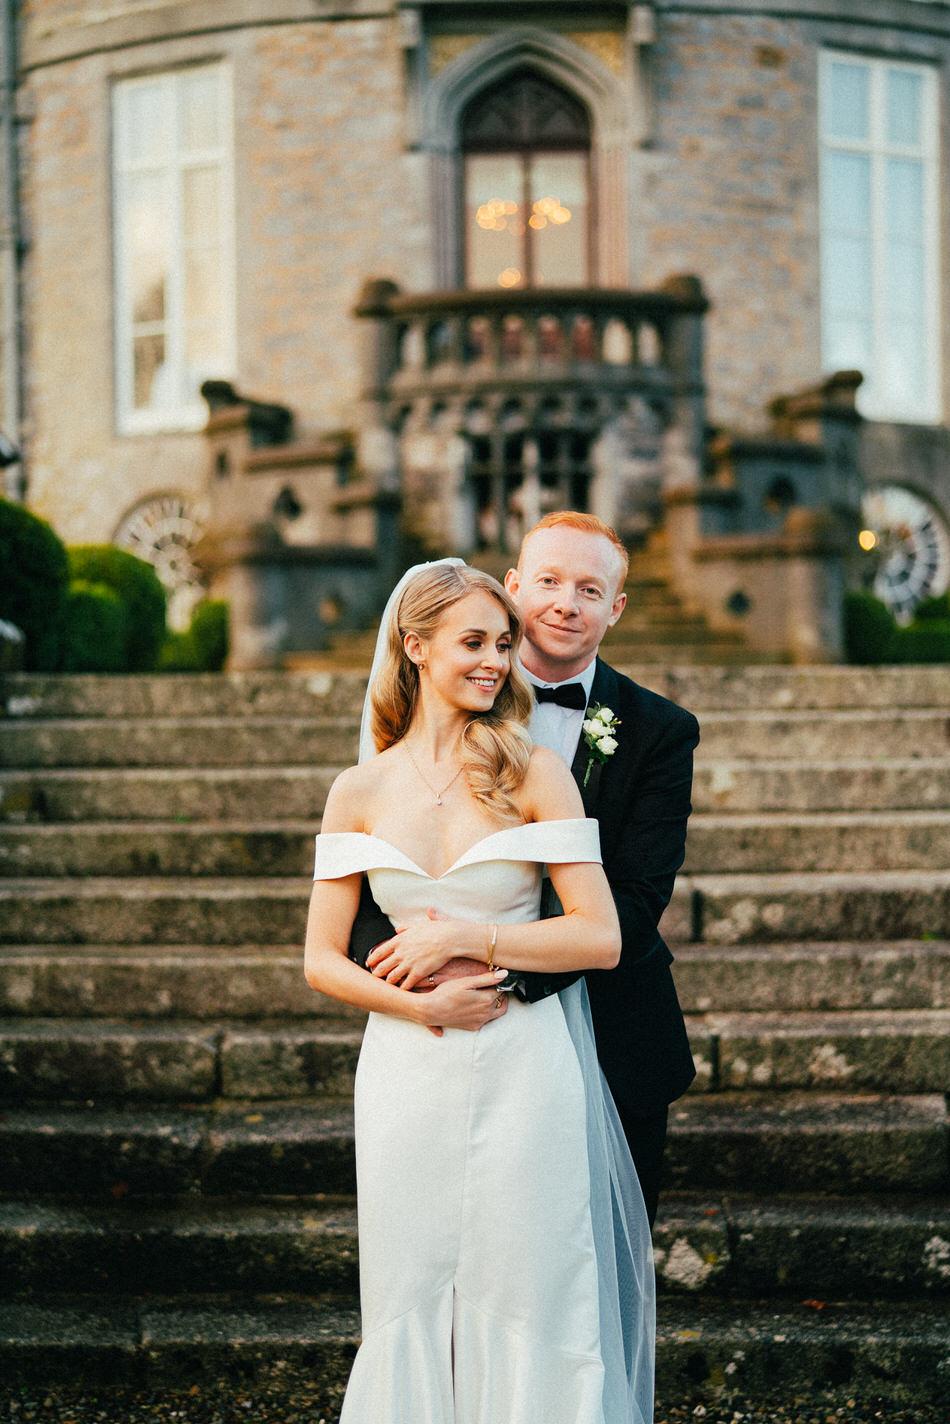 Castle-wedding-ireland-photos- 0197 139